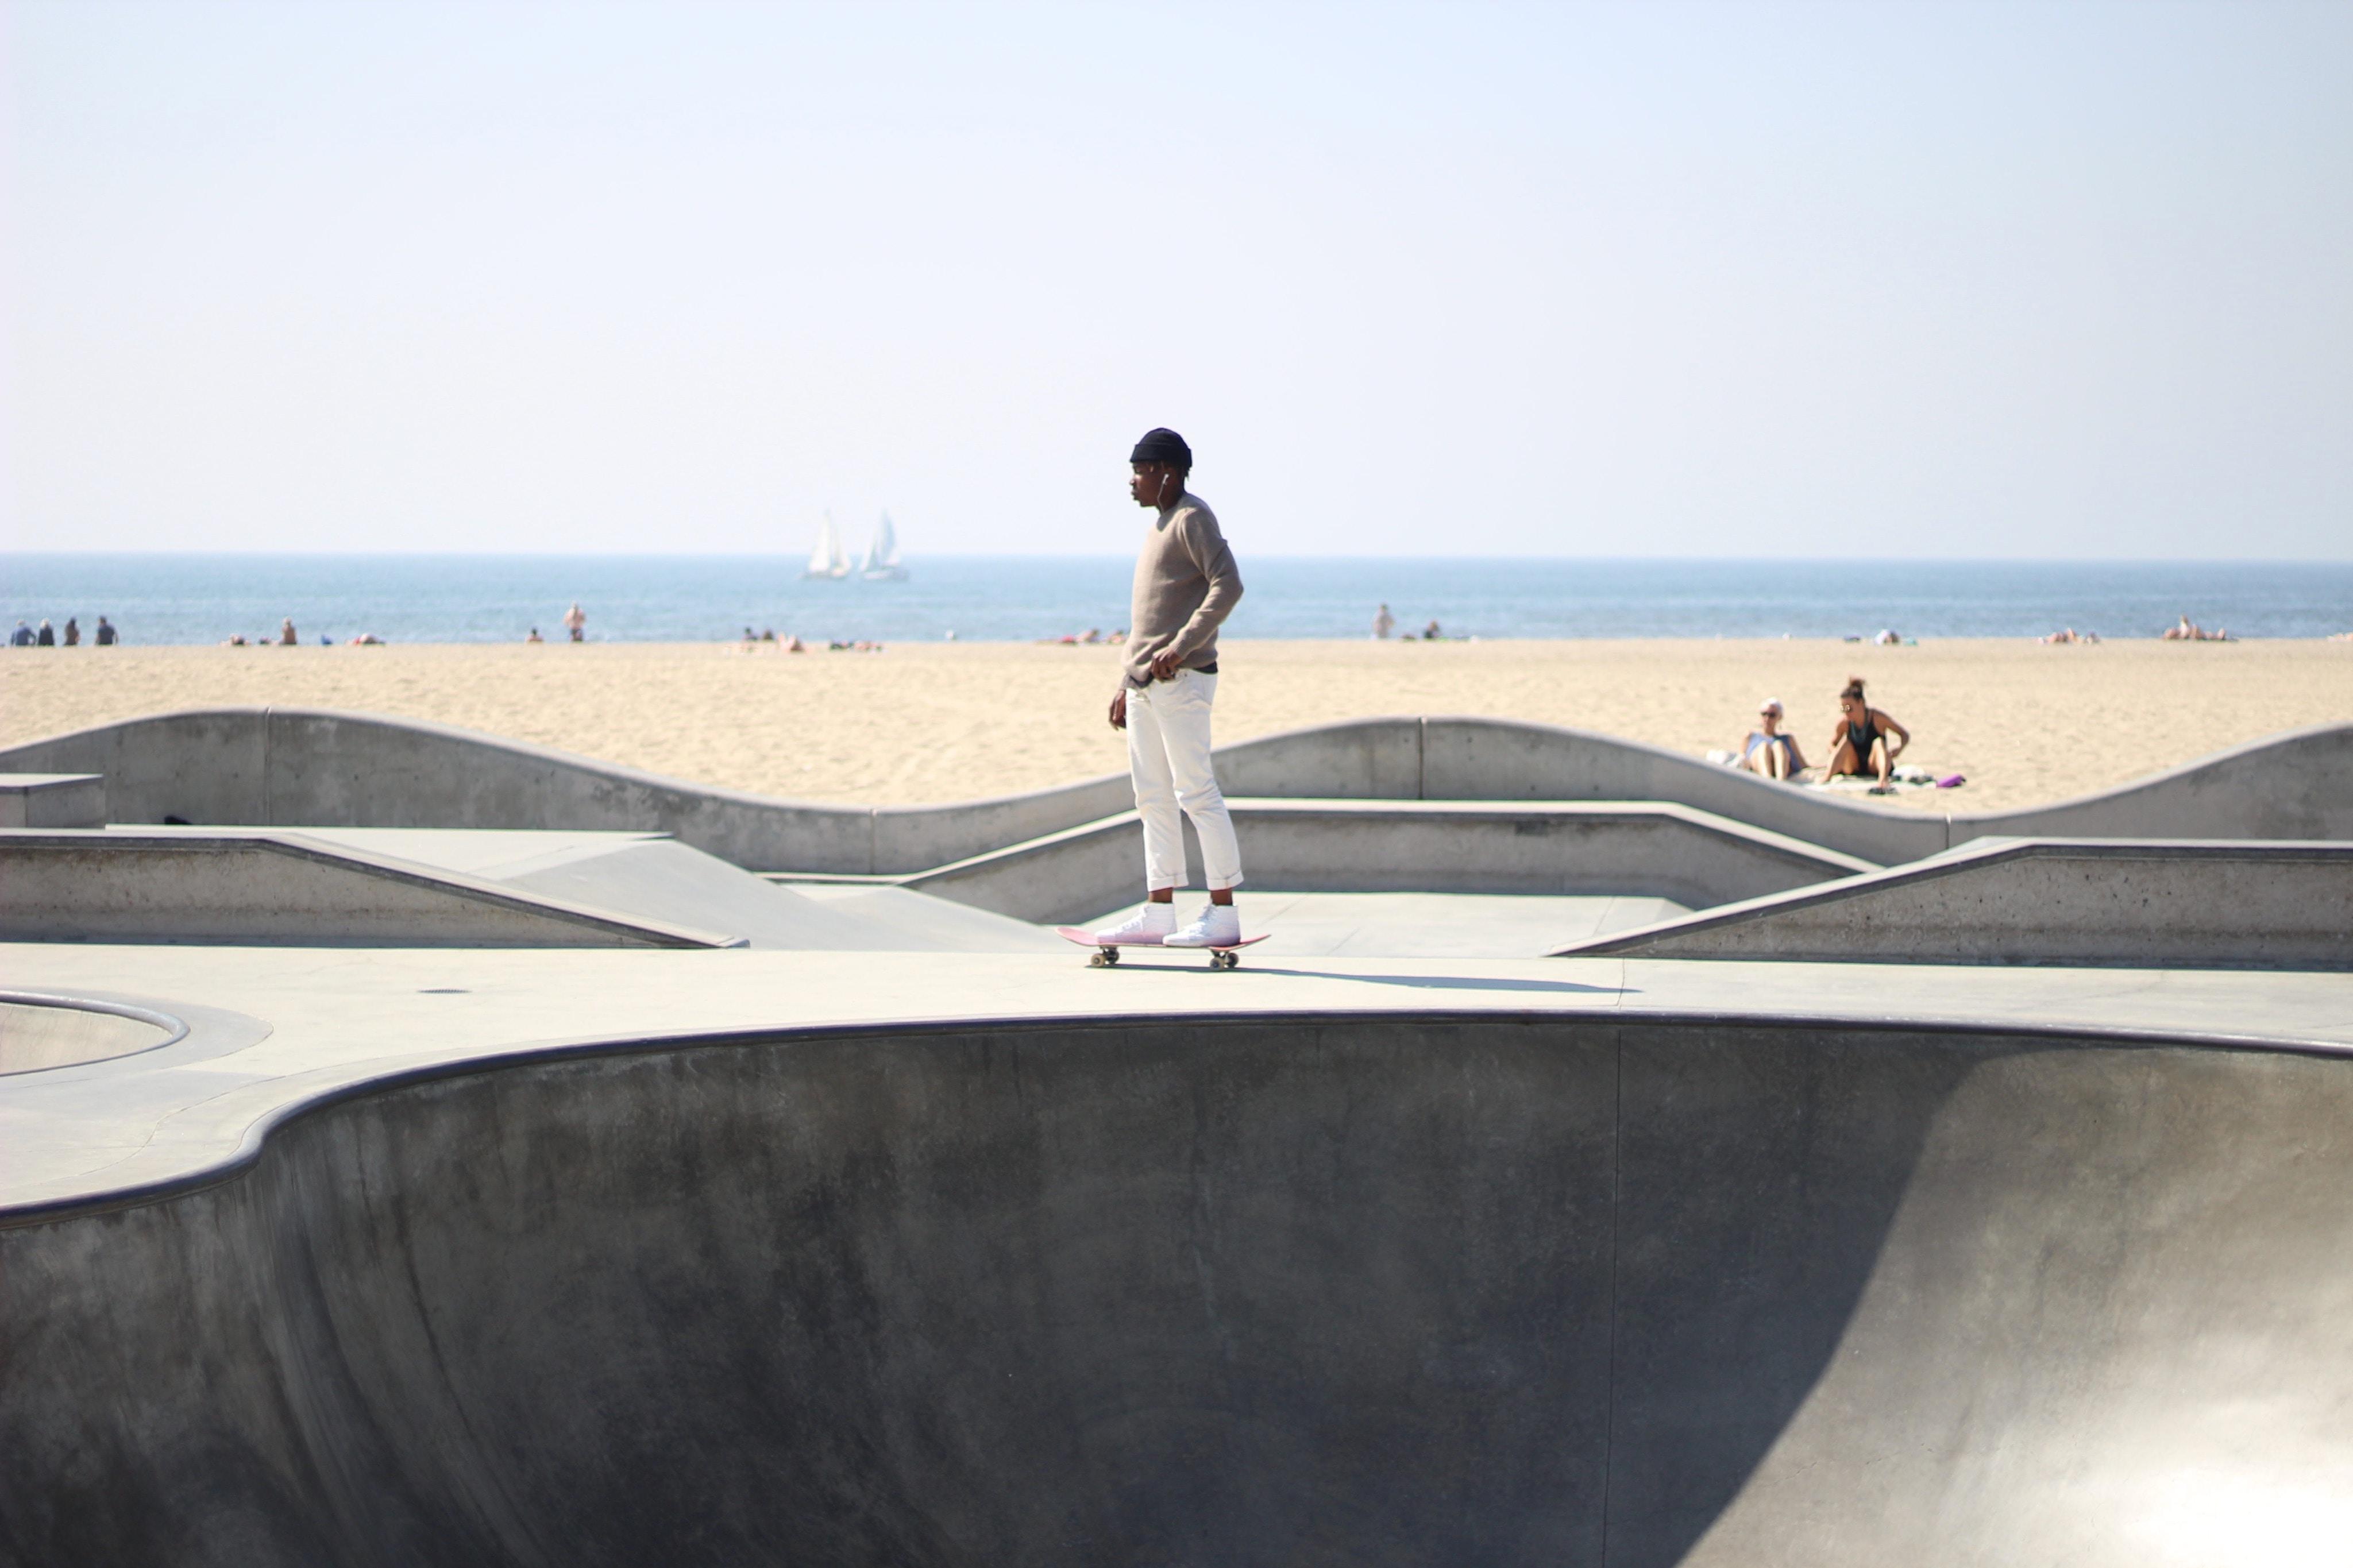 man skateboarding